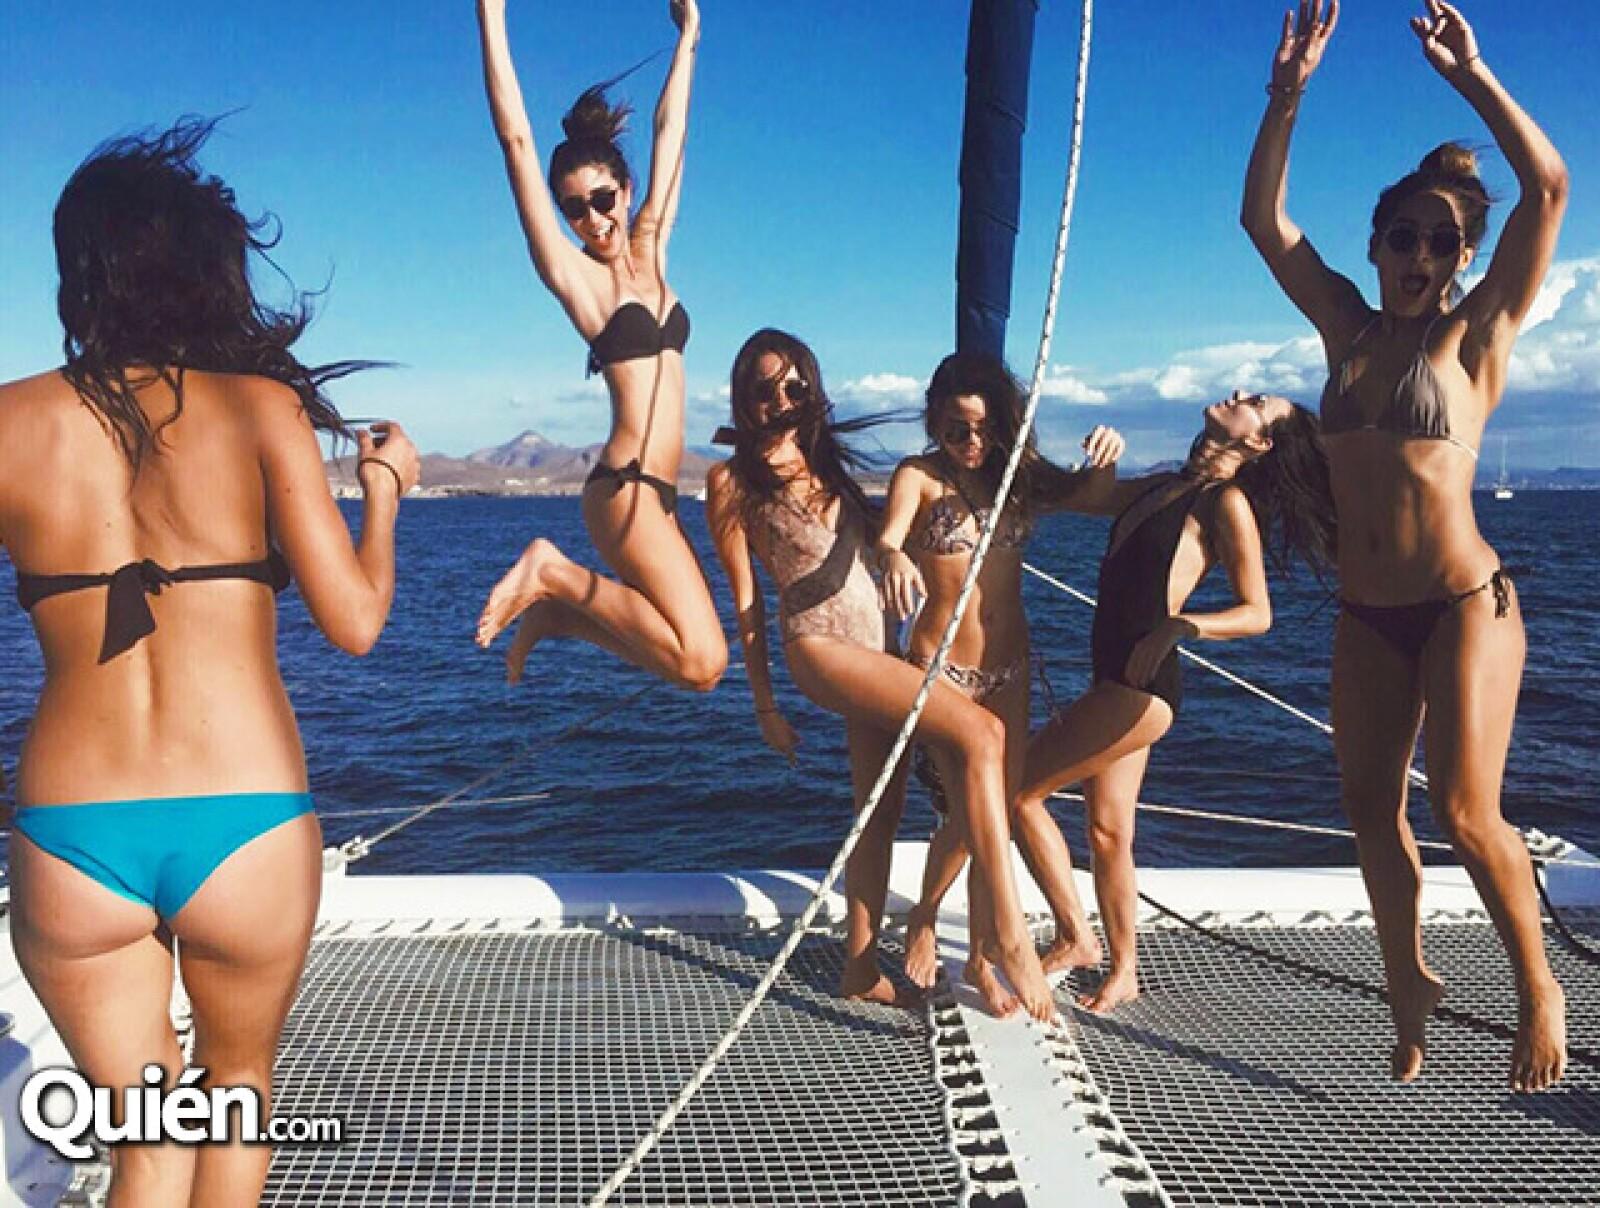 Ananda Mora,Chloe Amutio. Erika Vargas,Karina Torres,Chantal Torres e Ivonne Arambula